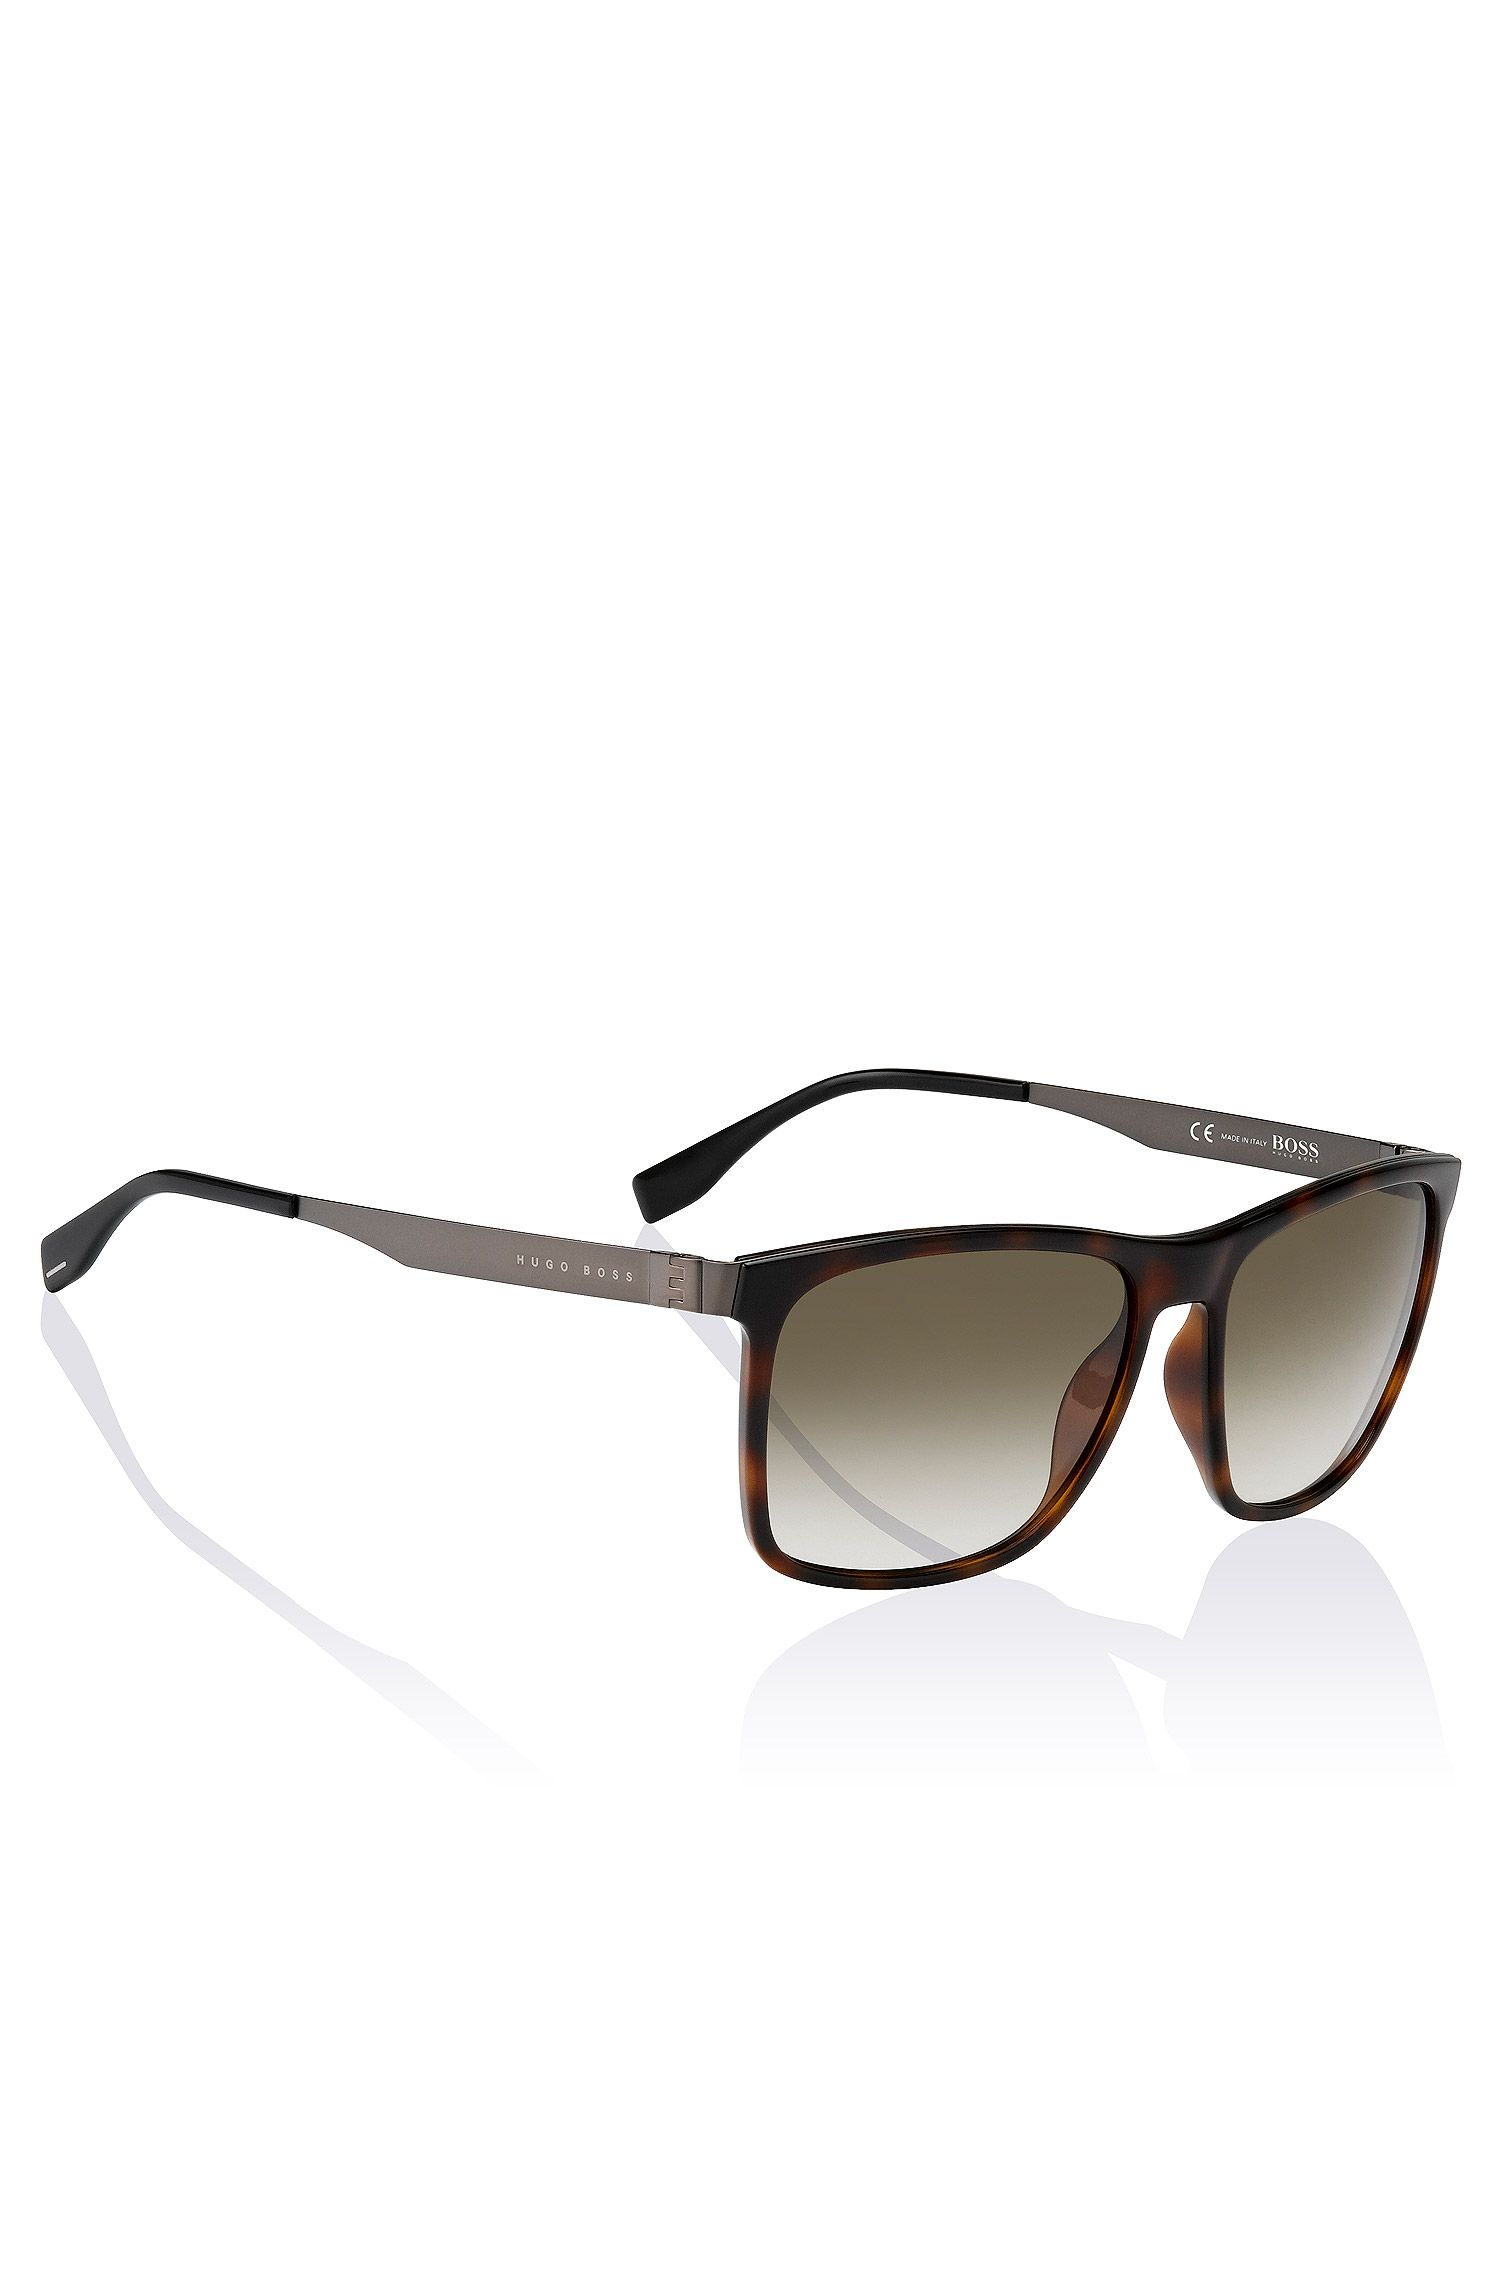 Sonnenbrille ´BOSS 0671/S` aus Acetat und Edelstahl